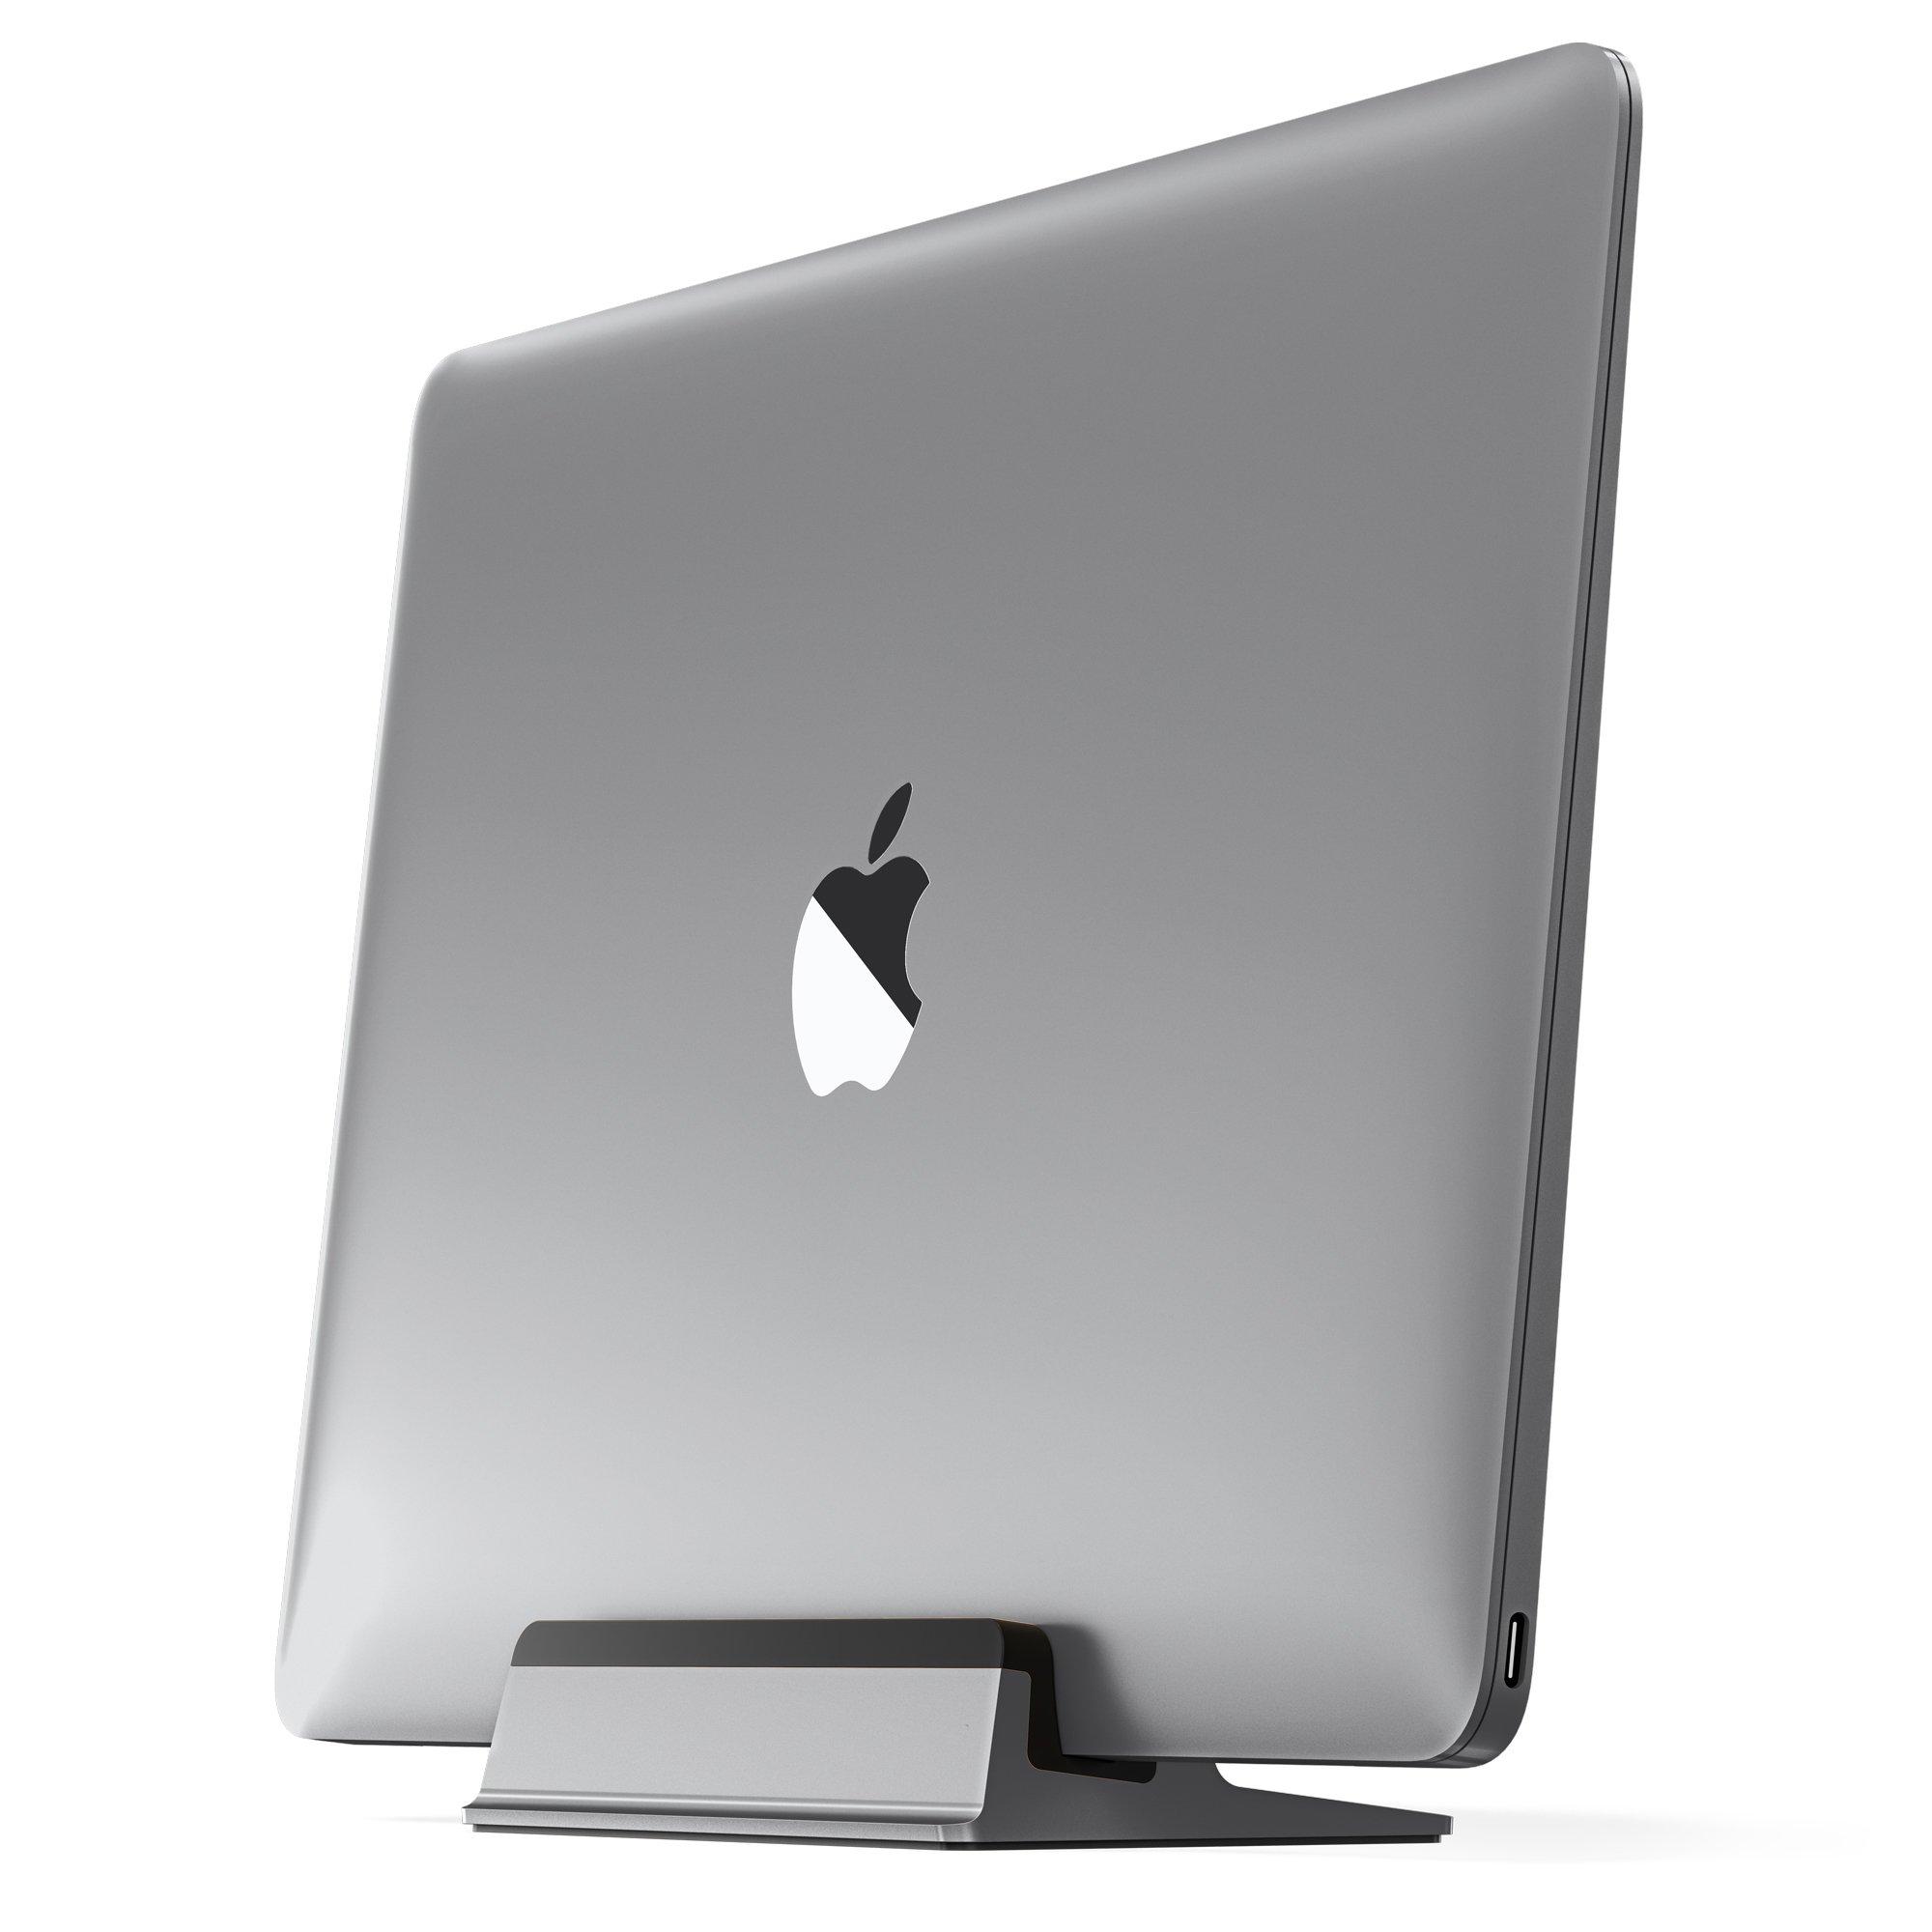 UPPERCASE KRADL Aluminum Vertical Stand for MacBook 12'', Space Gray/Black